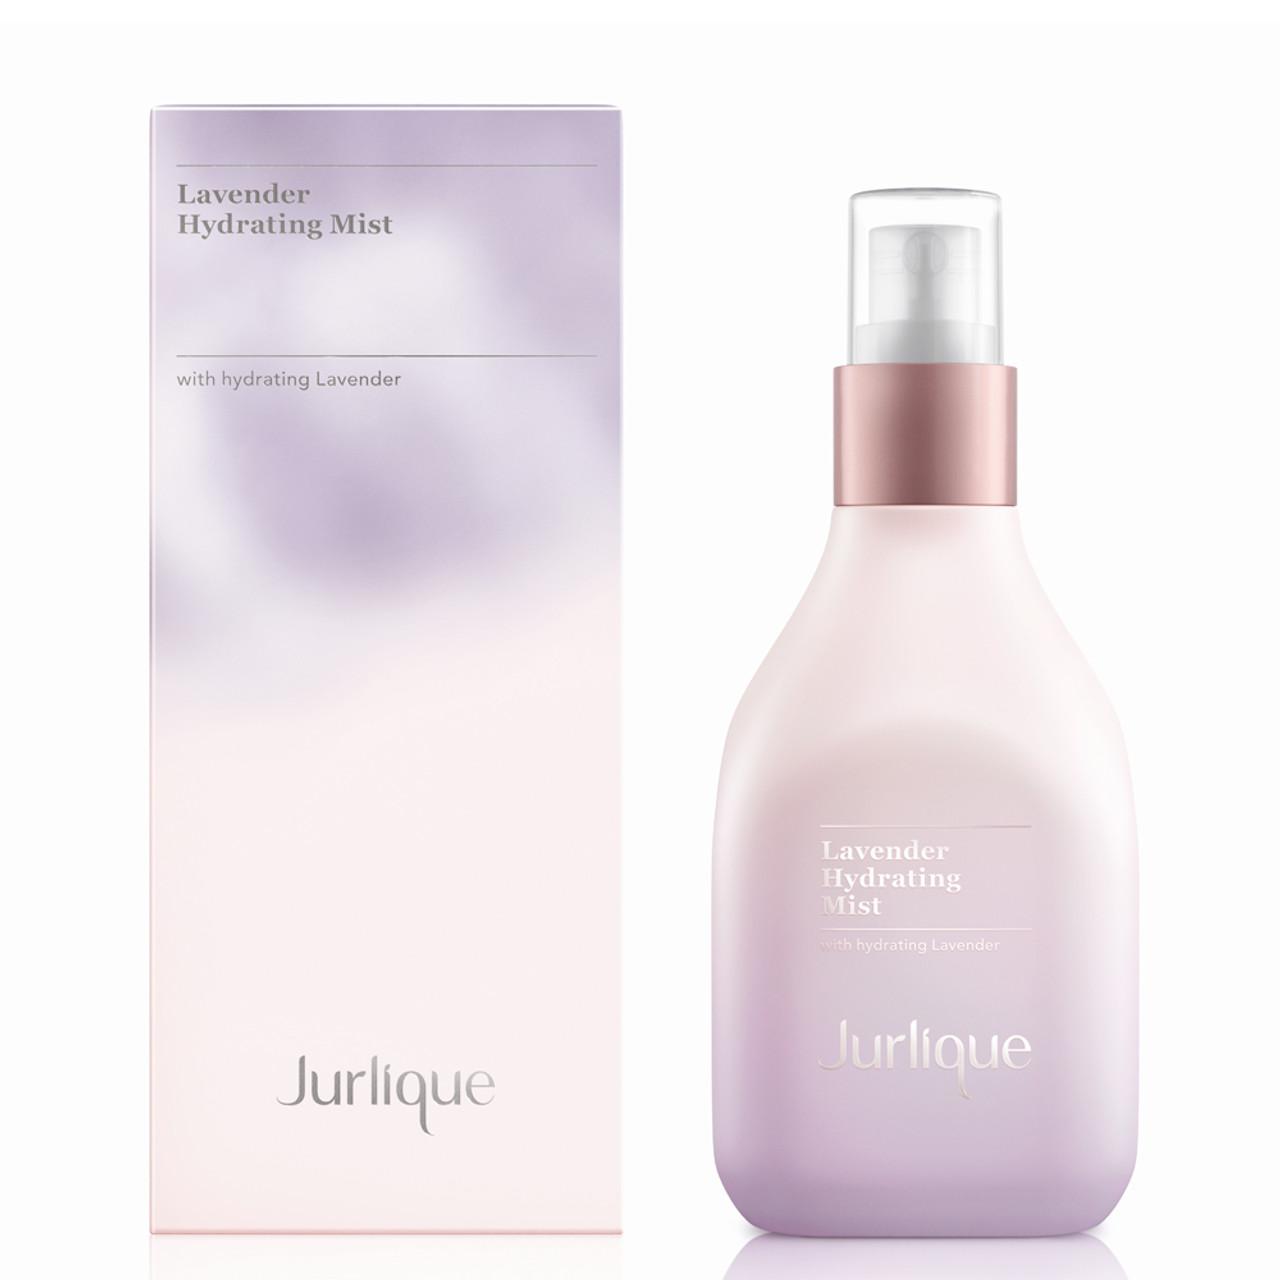 Jurlique Lavender Hydrating Mist